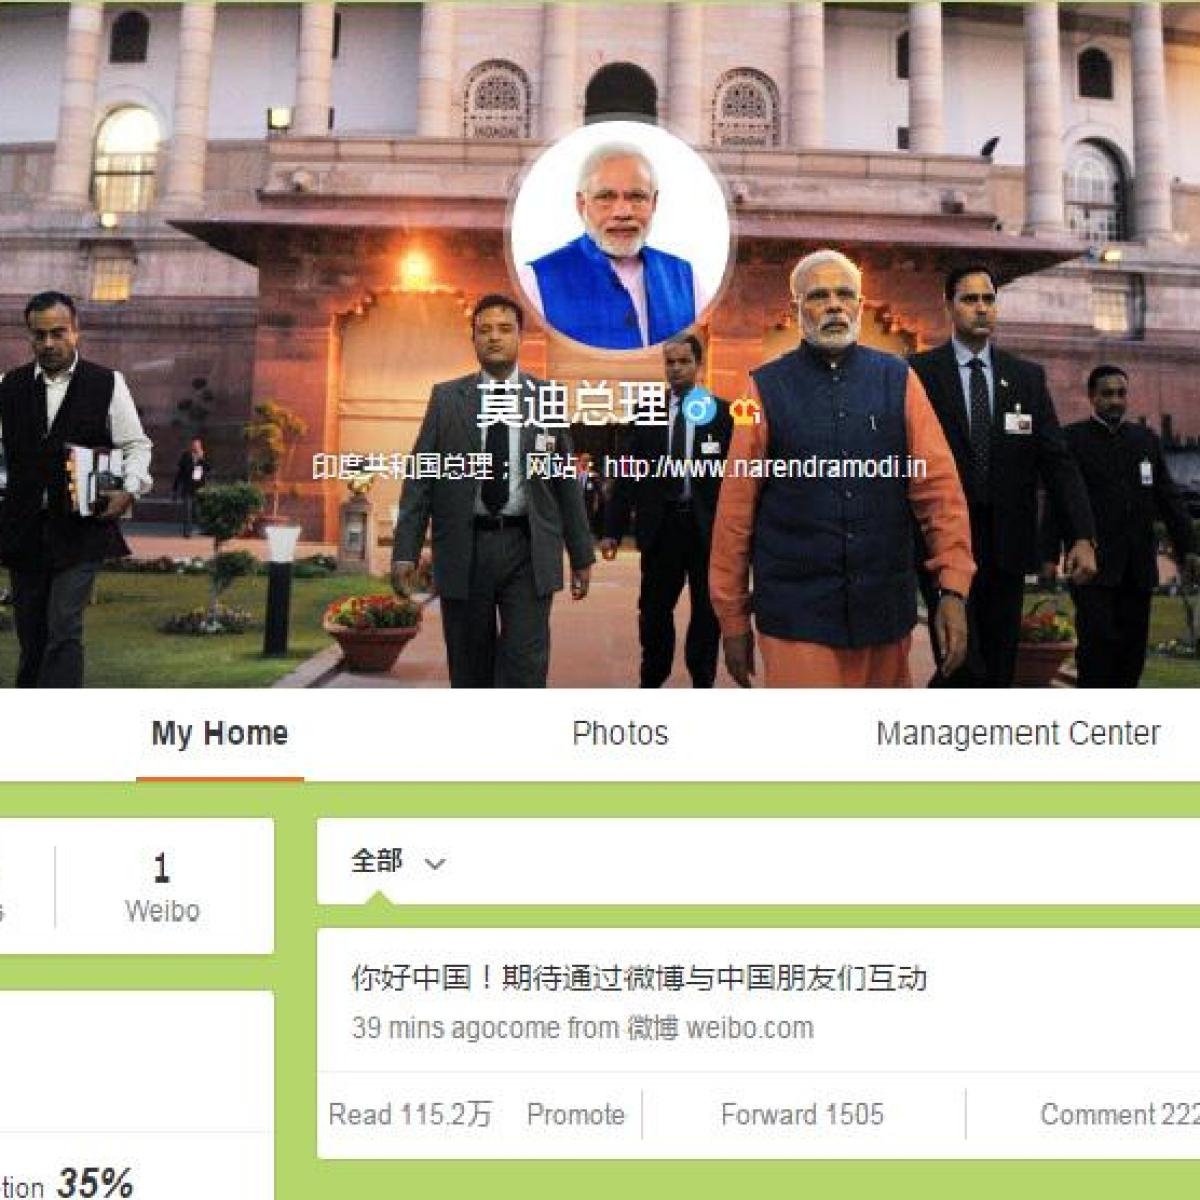 TikTok banned: Has PM Modi left Weibo?